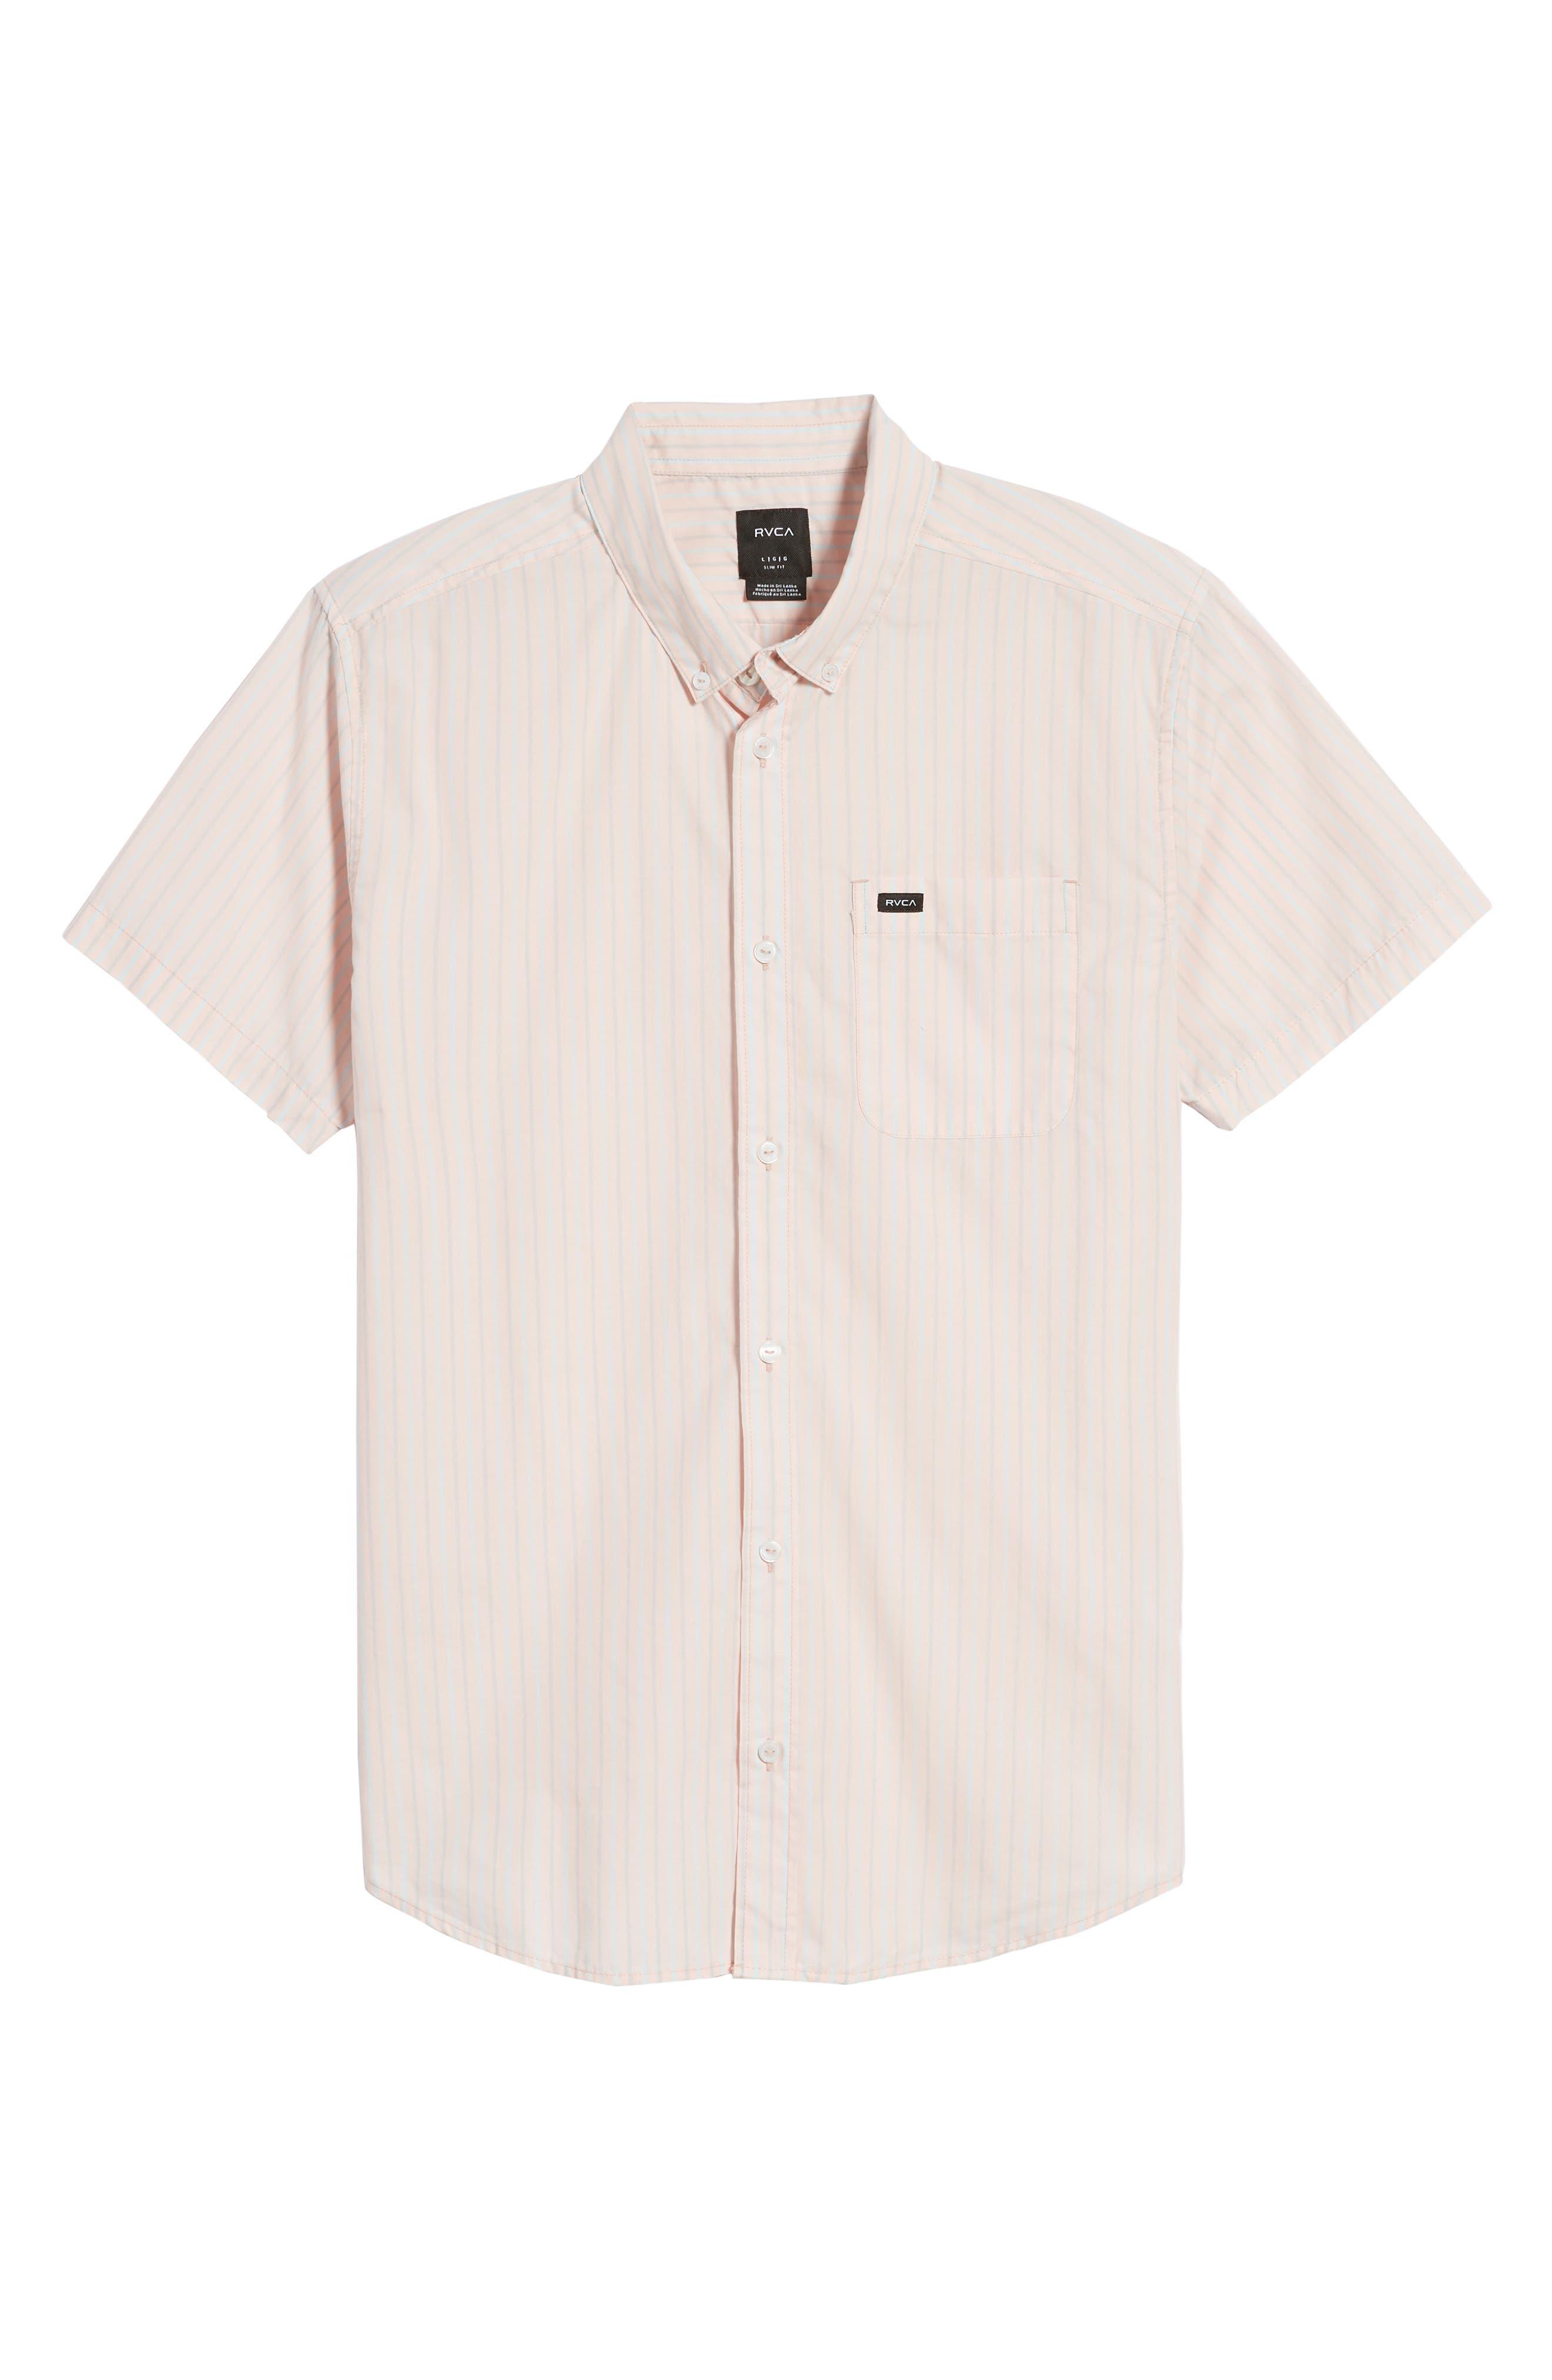 Everyday Stripe Shirt,                             Alternate thumbnail 6, color,                             653